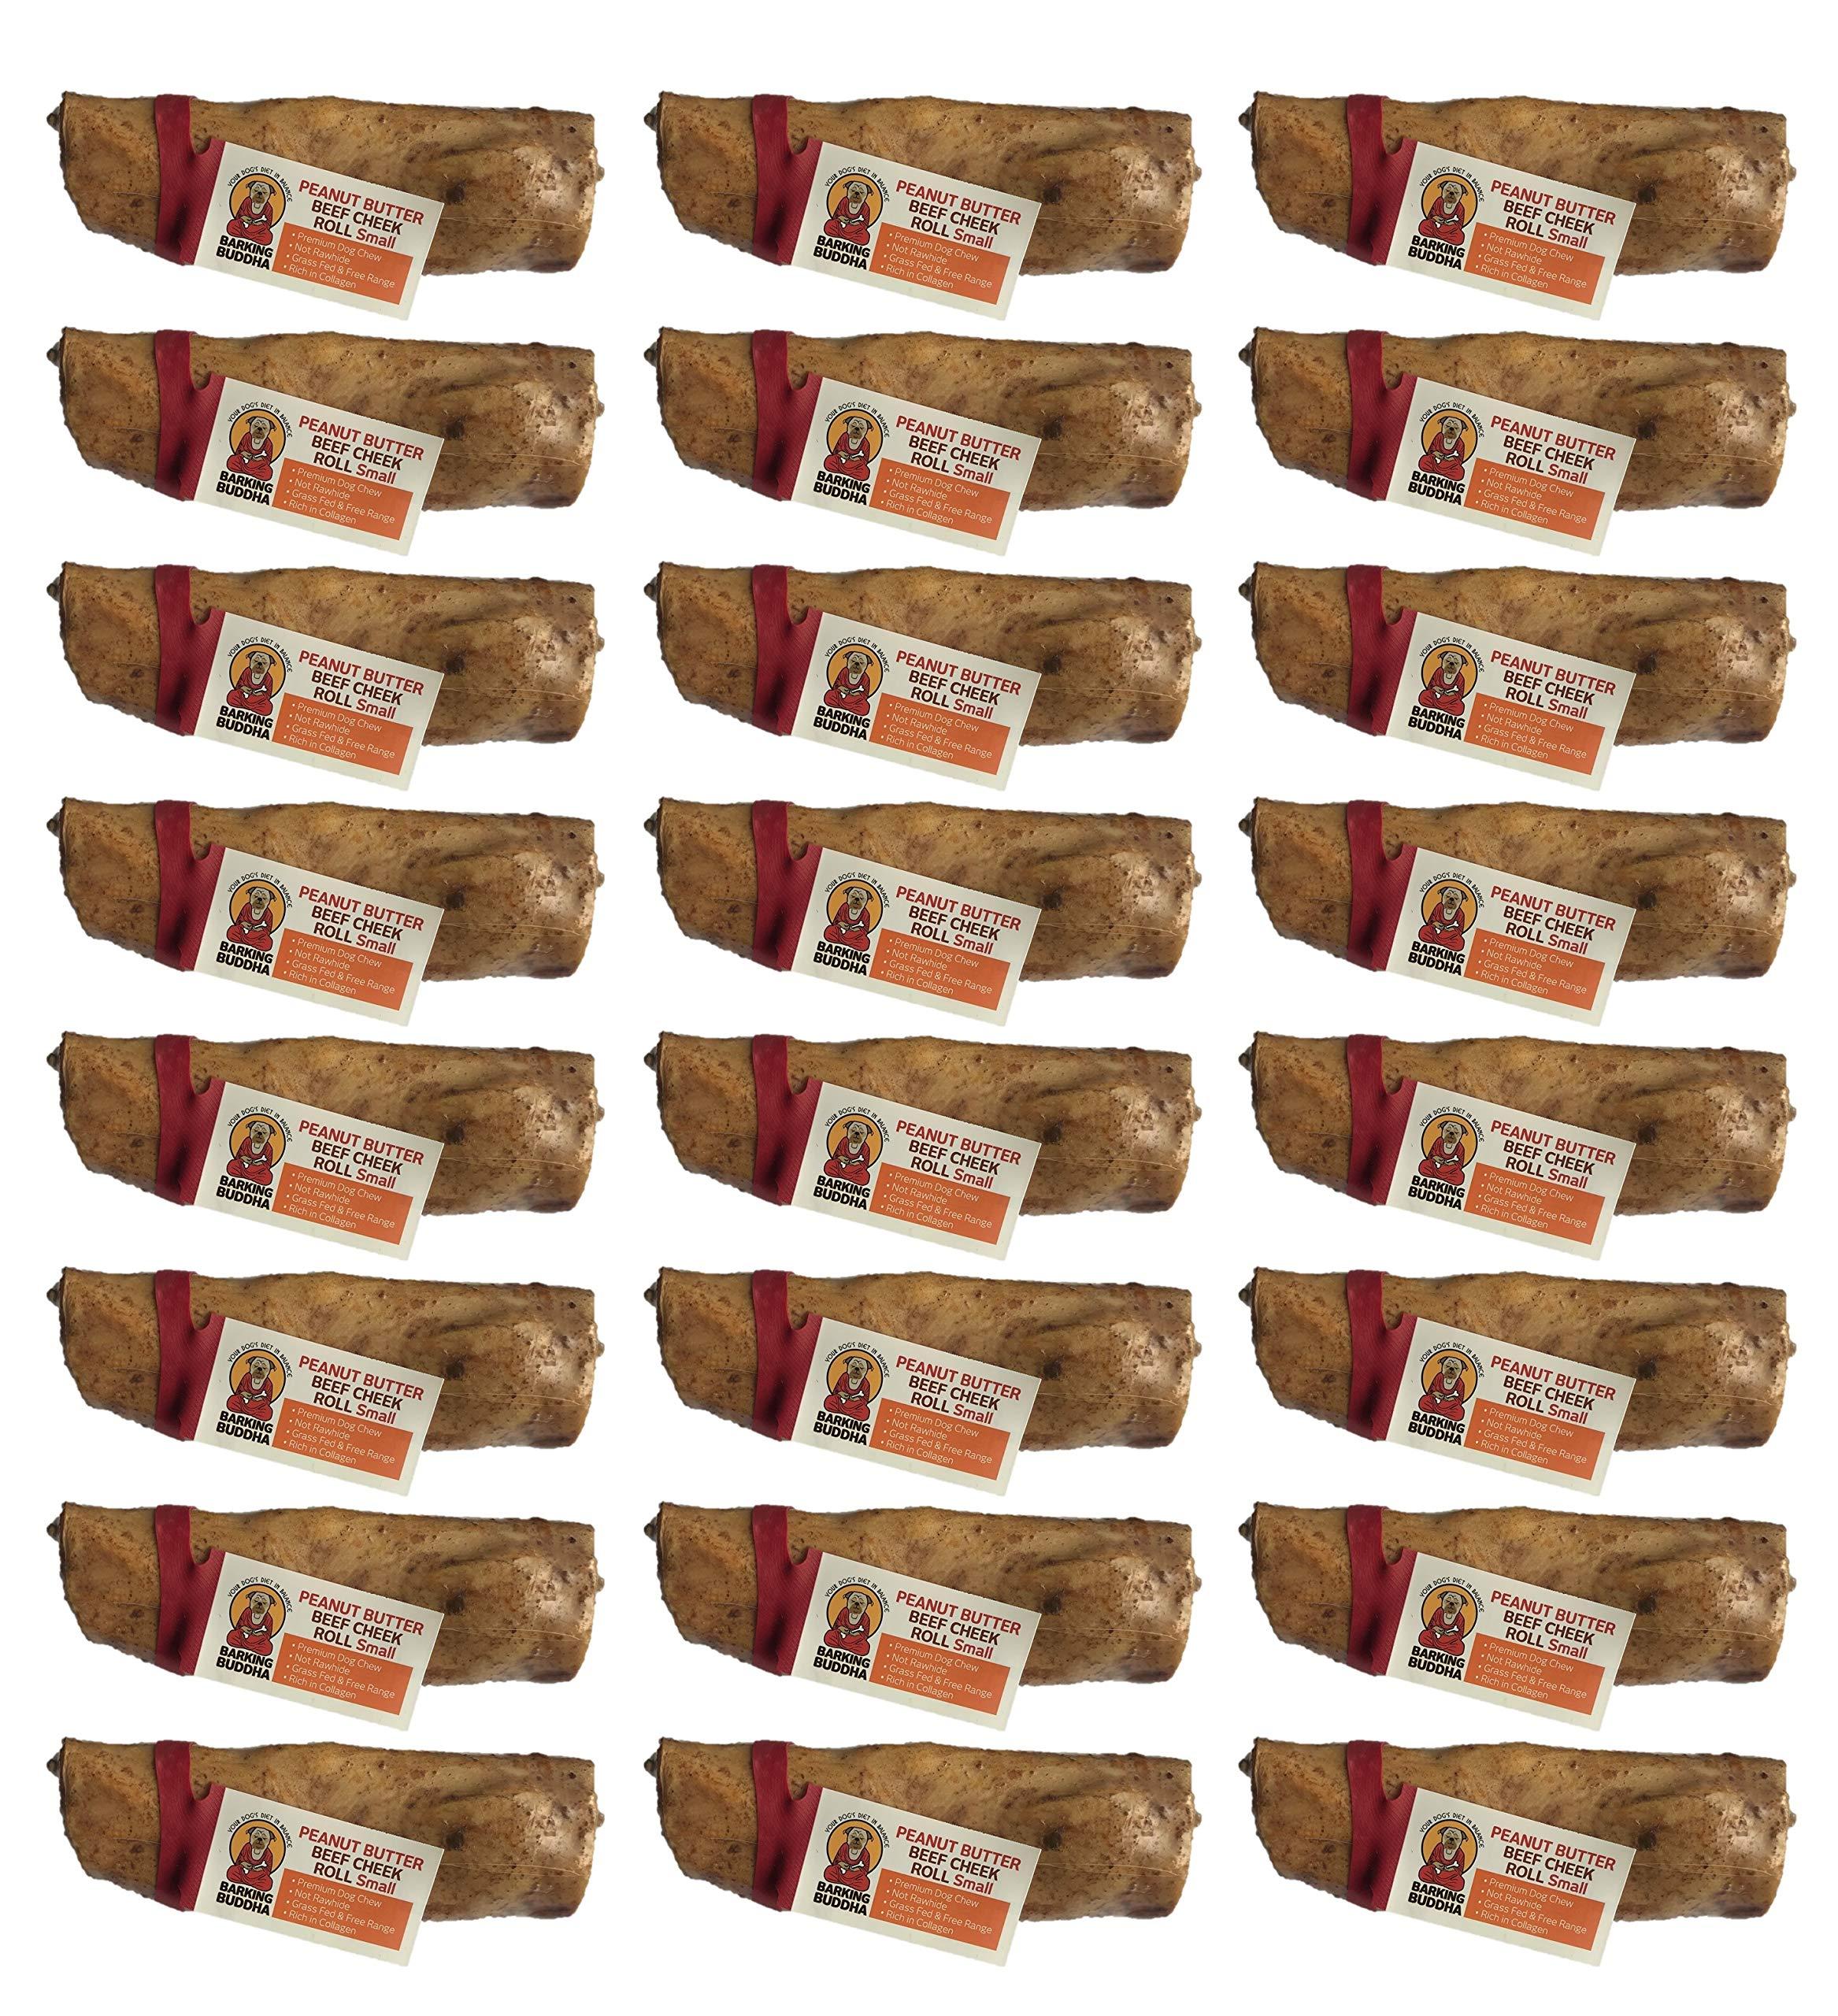 Barking Buddha Box of 24 Peanut Butter Beef Cheek Rolls, Small by Barking Buddha